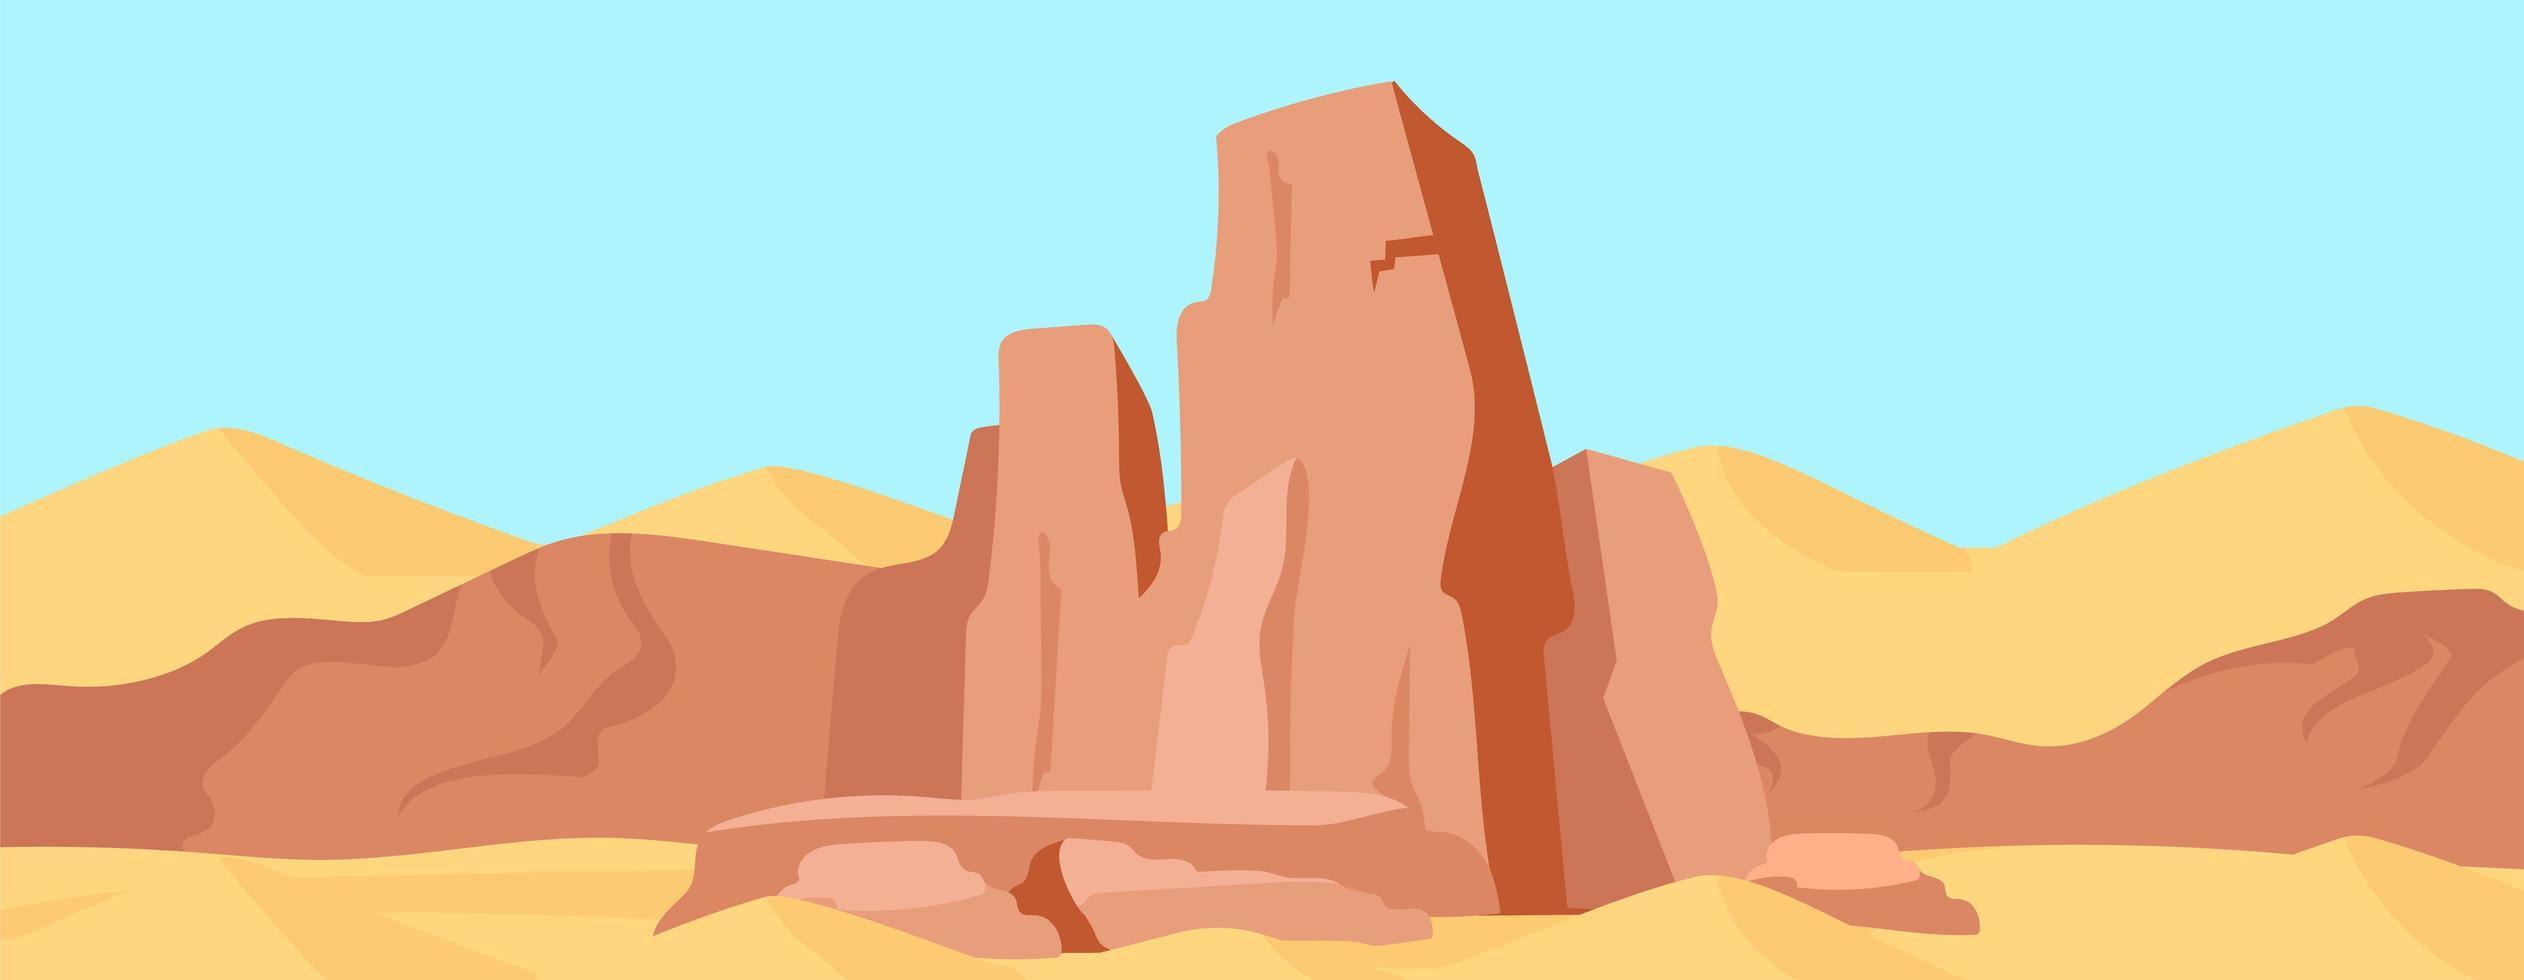 Canyon Rock Szene vektor